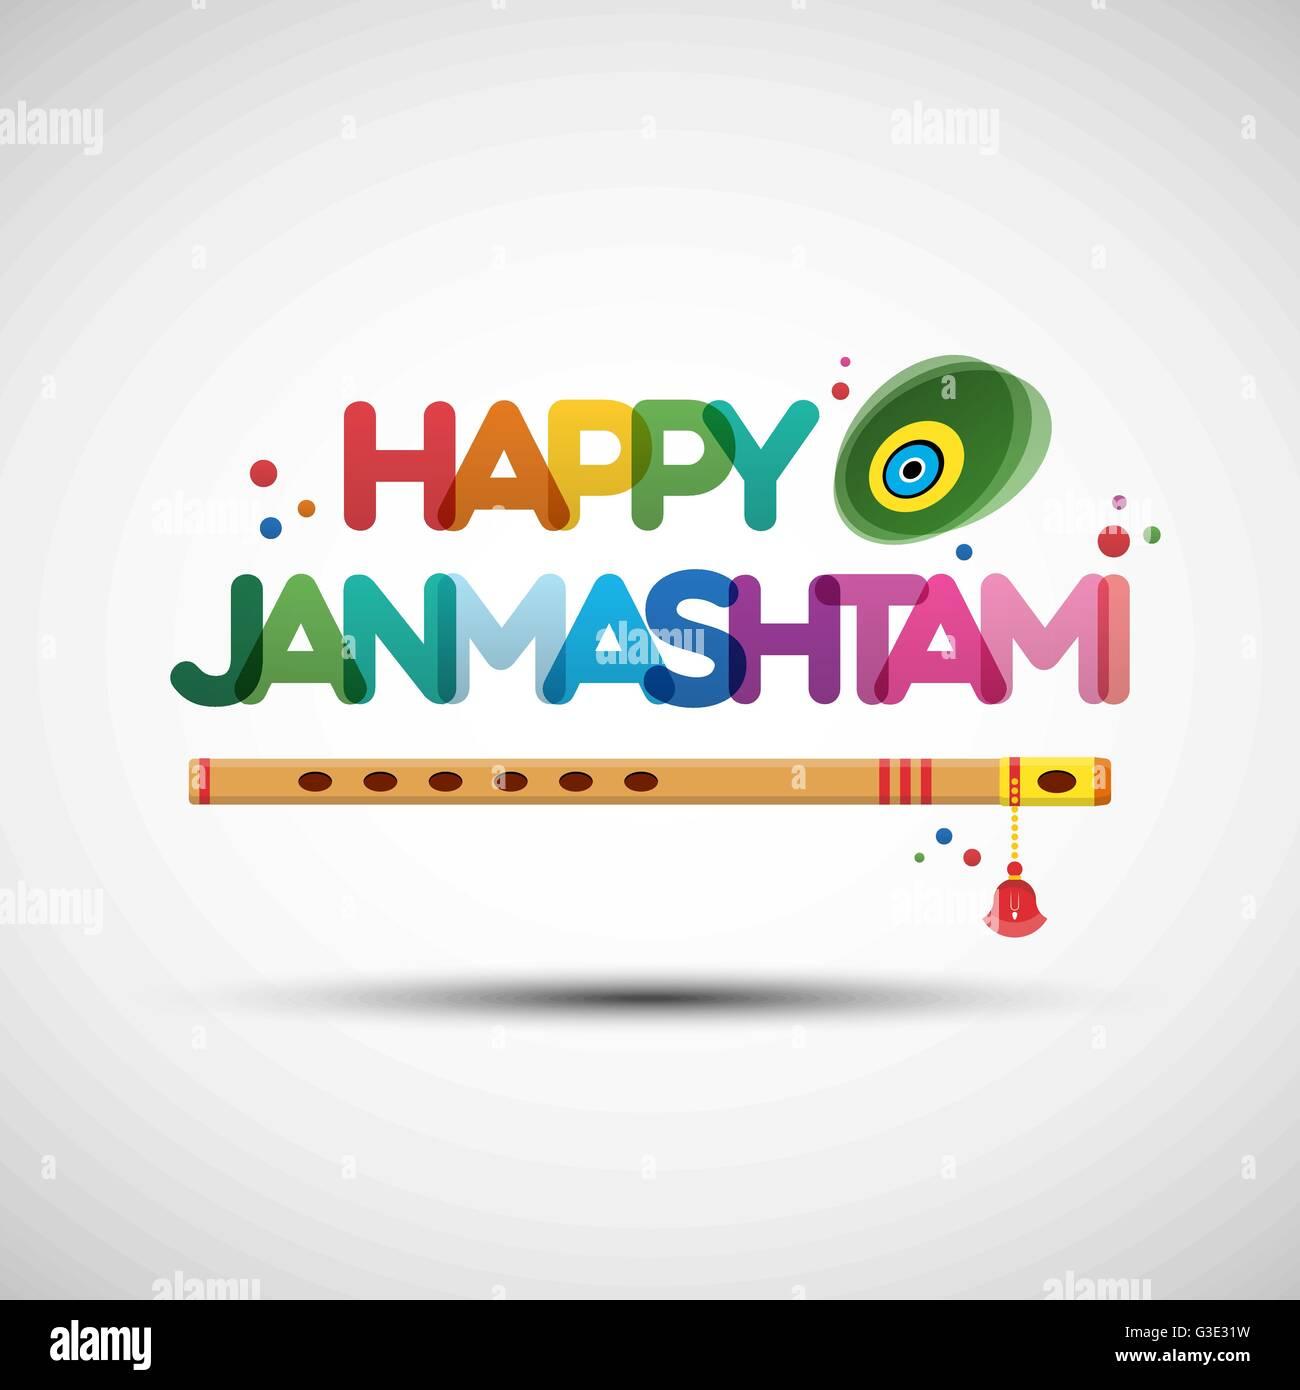 Vector illustration of krishna janmashtami greeting card design vector illustration of krishna janmashtami greeting card design with creative multicolored transparent text happy janmashtami m4hsunfo